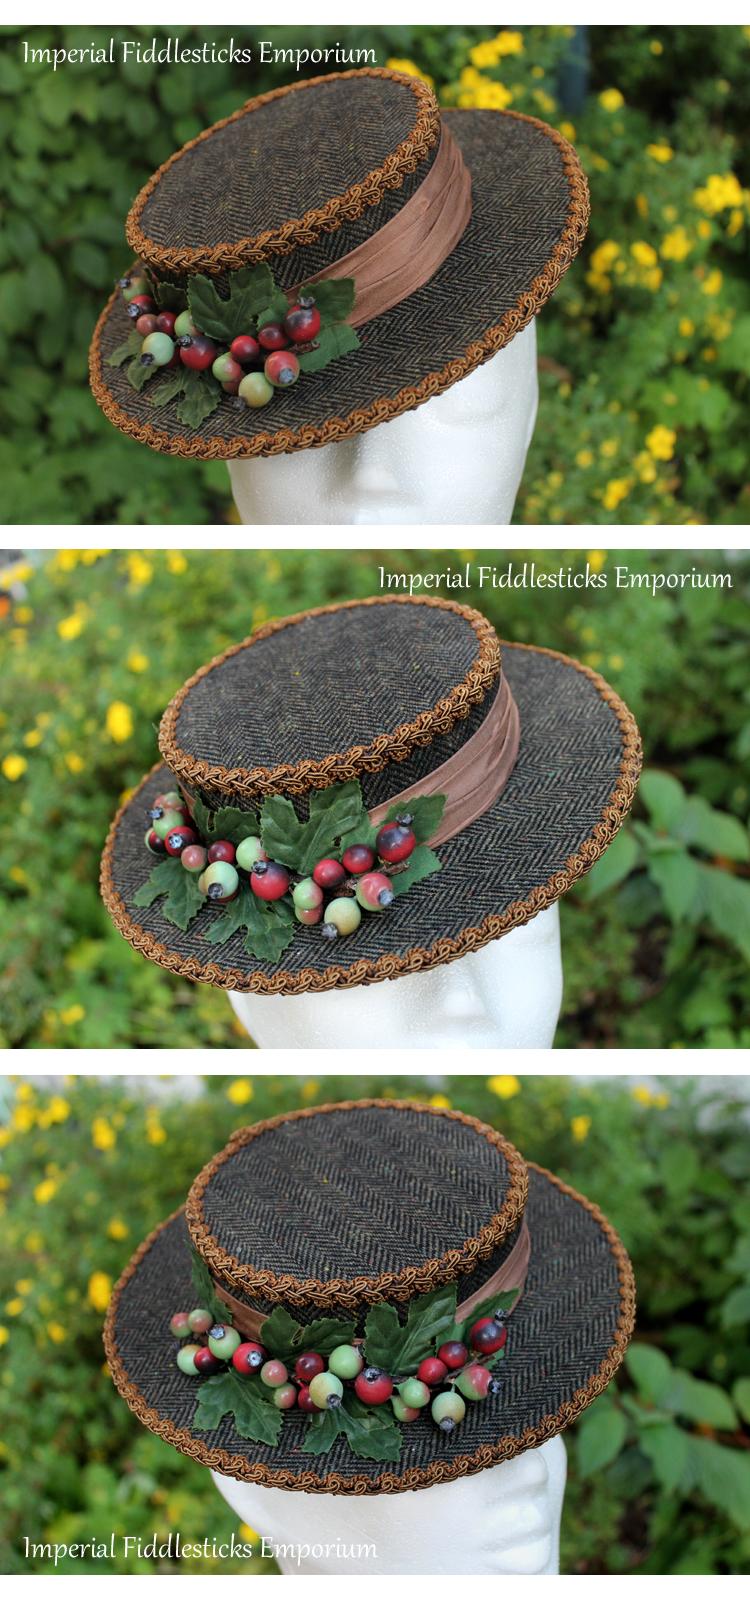 Nature's Harvest Mini Boater Hat